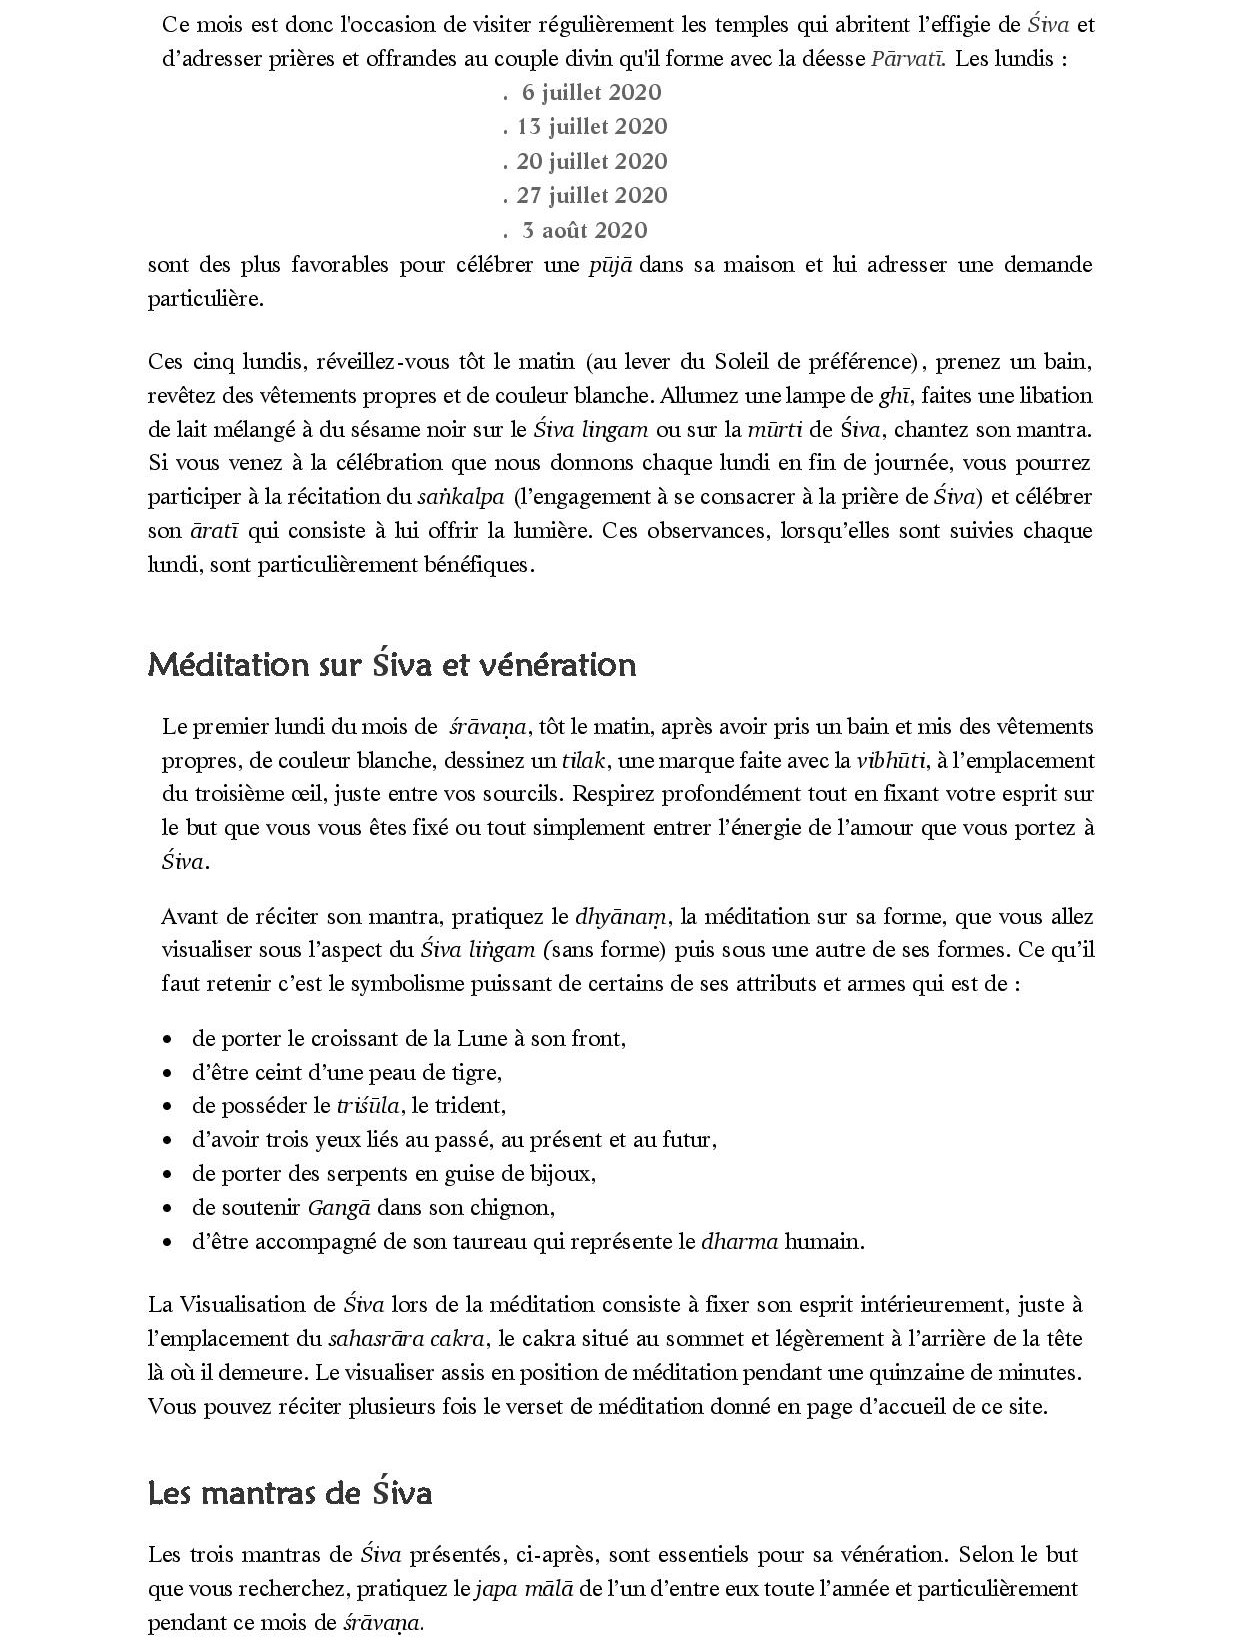 shiva sravana texte 2020-page-004